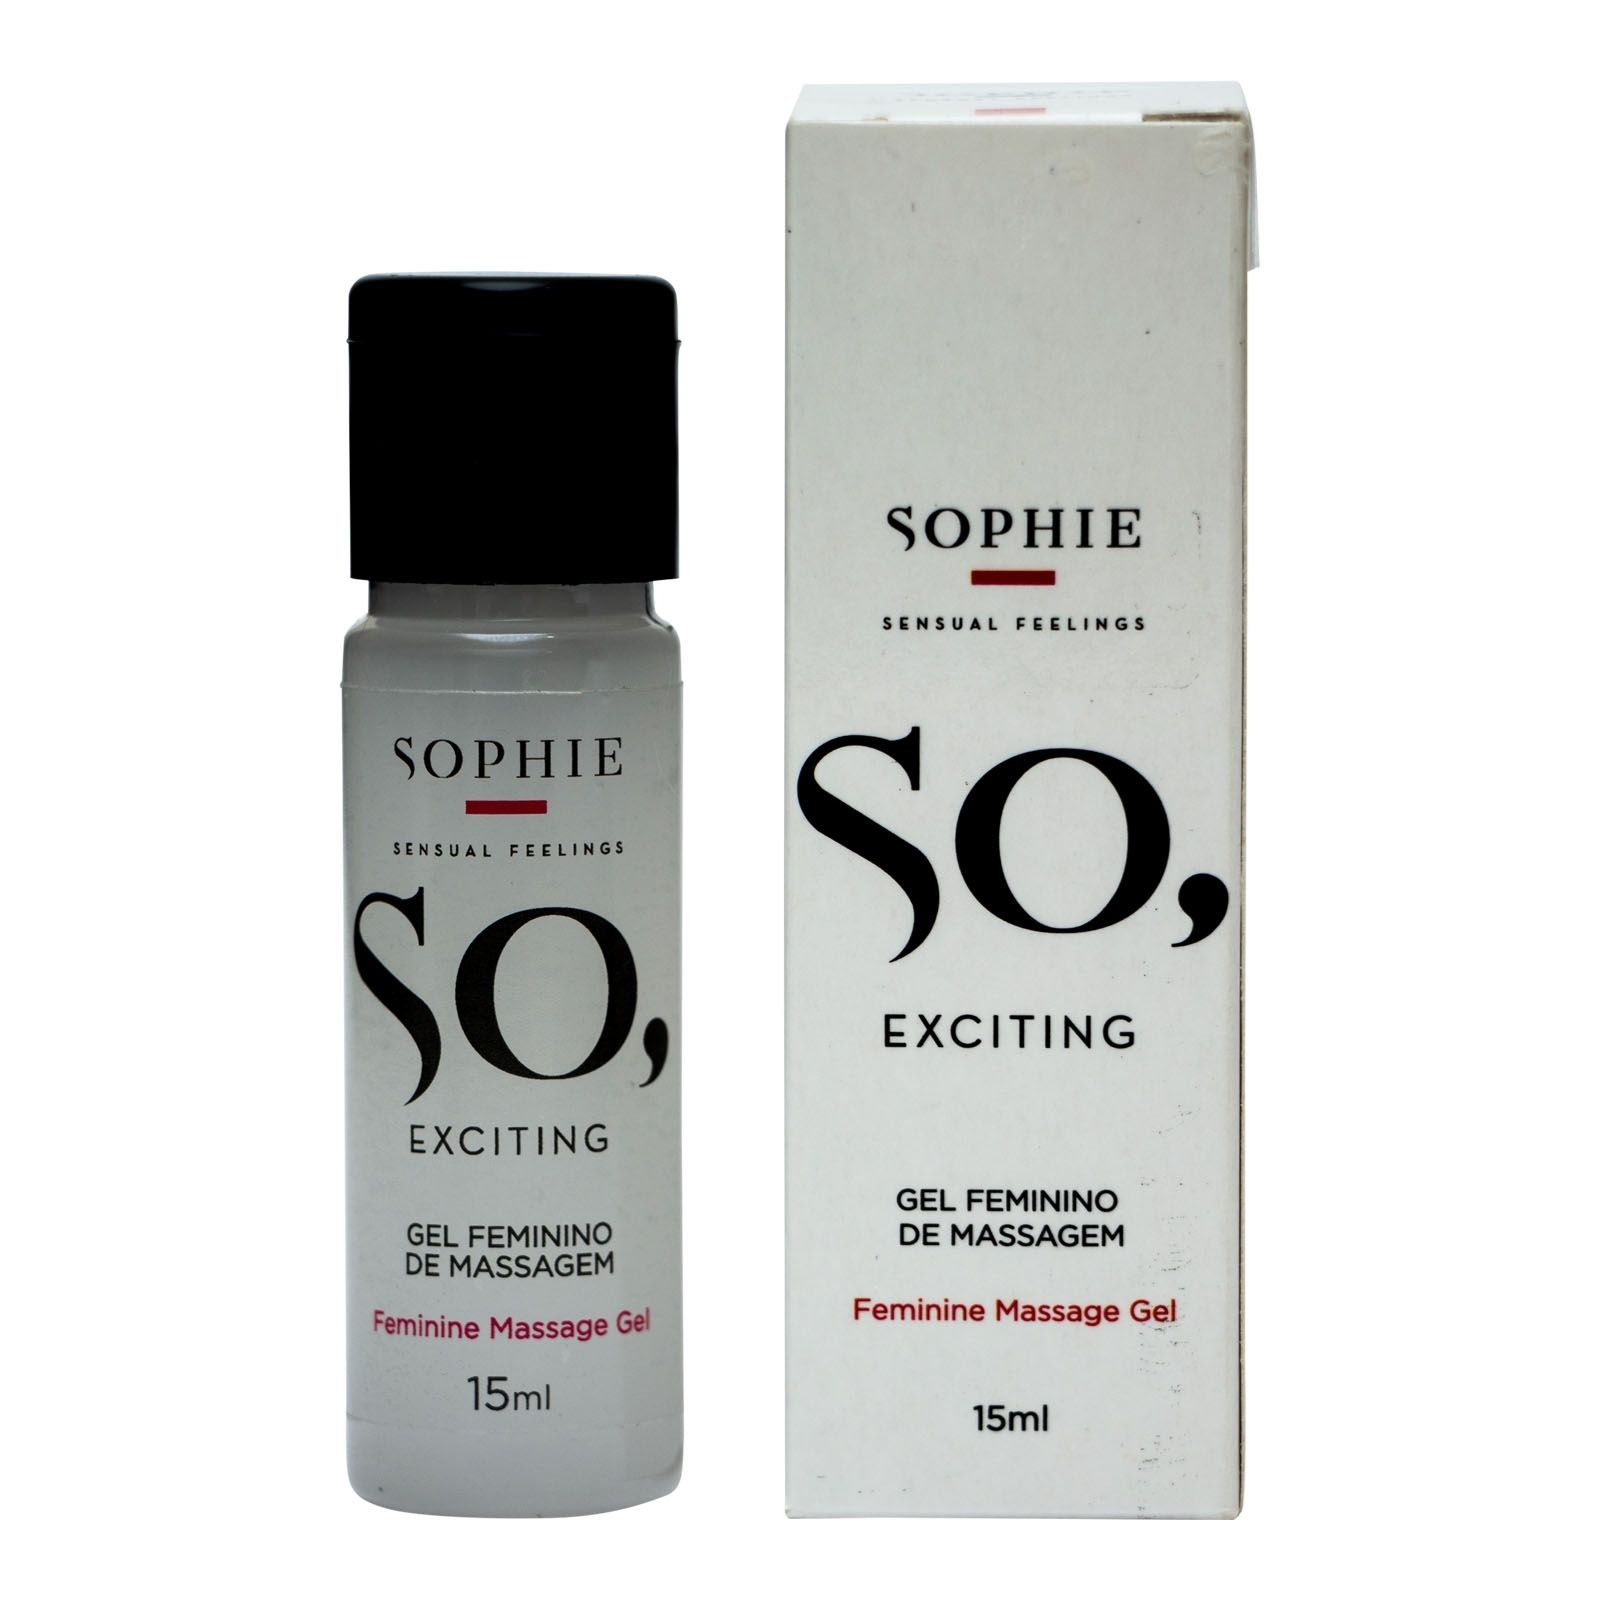 Gel Feminino de Massagem - So Exciting 15ml - Sophie